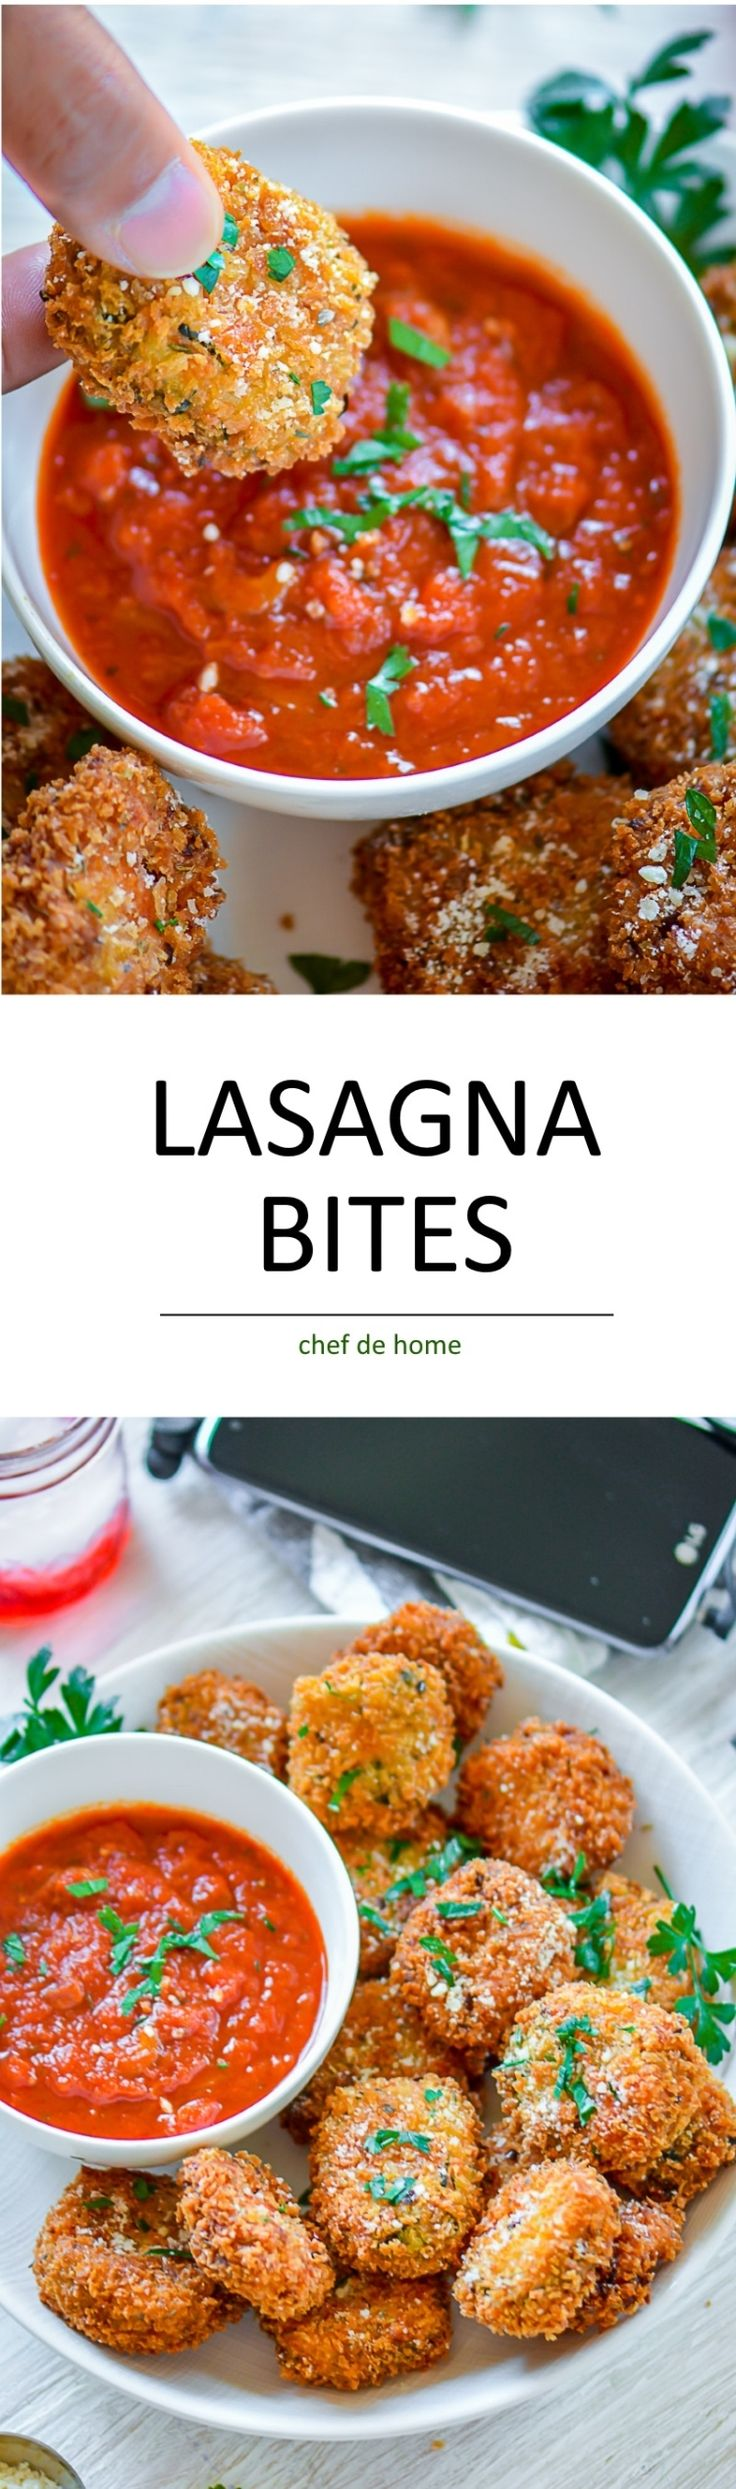 Fried Lasagna Bites for summer movie Night Snack |  #ad #DataAndAMovie @FamilyMobile  @chefdehome.com